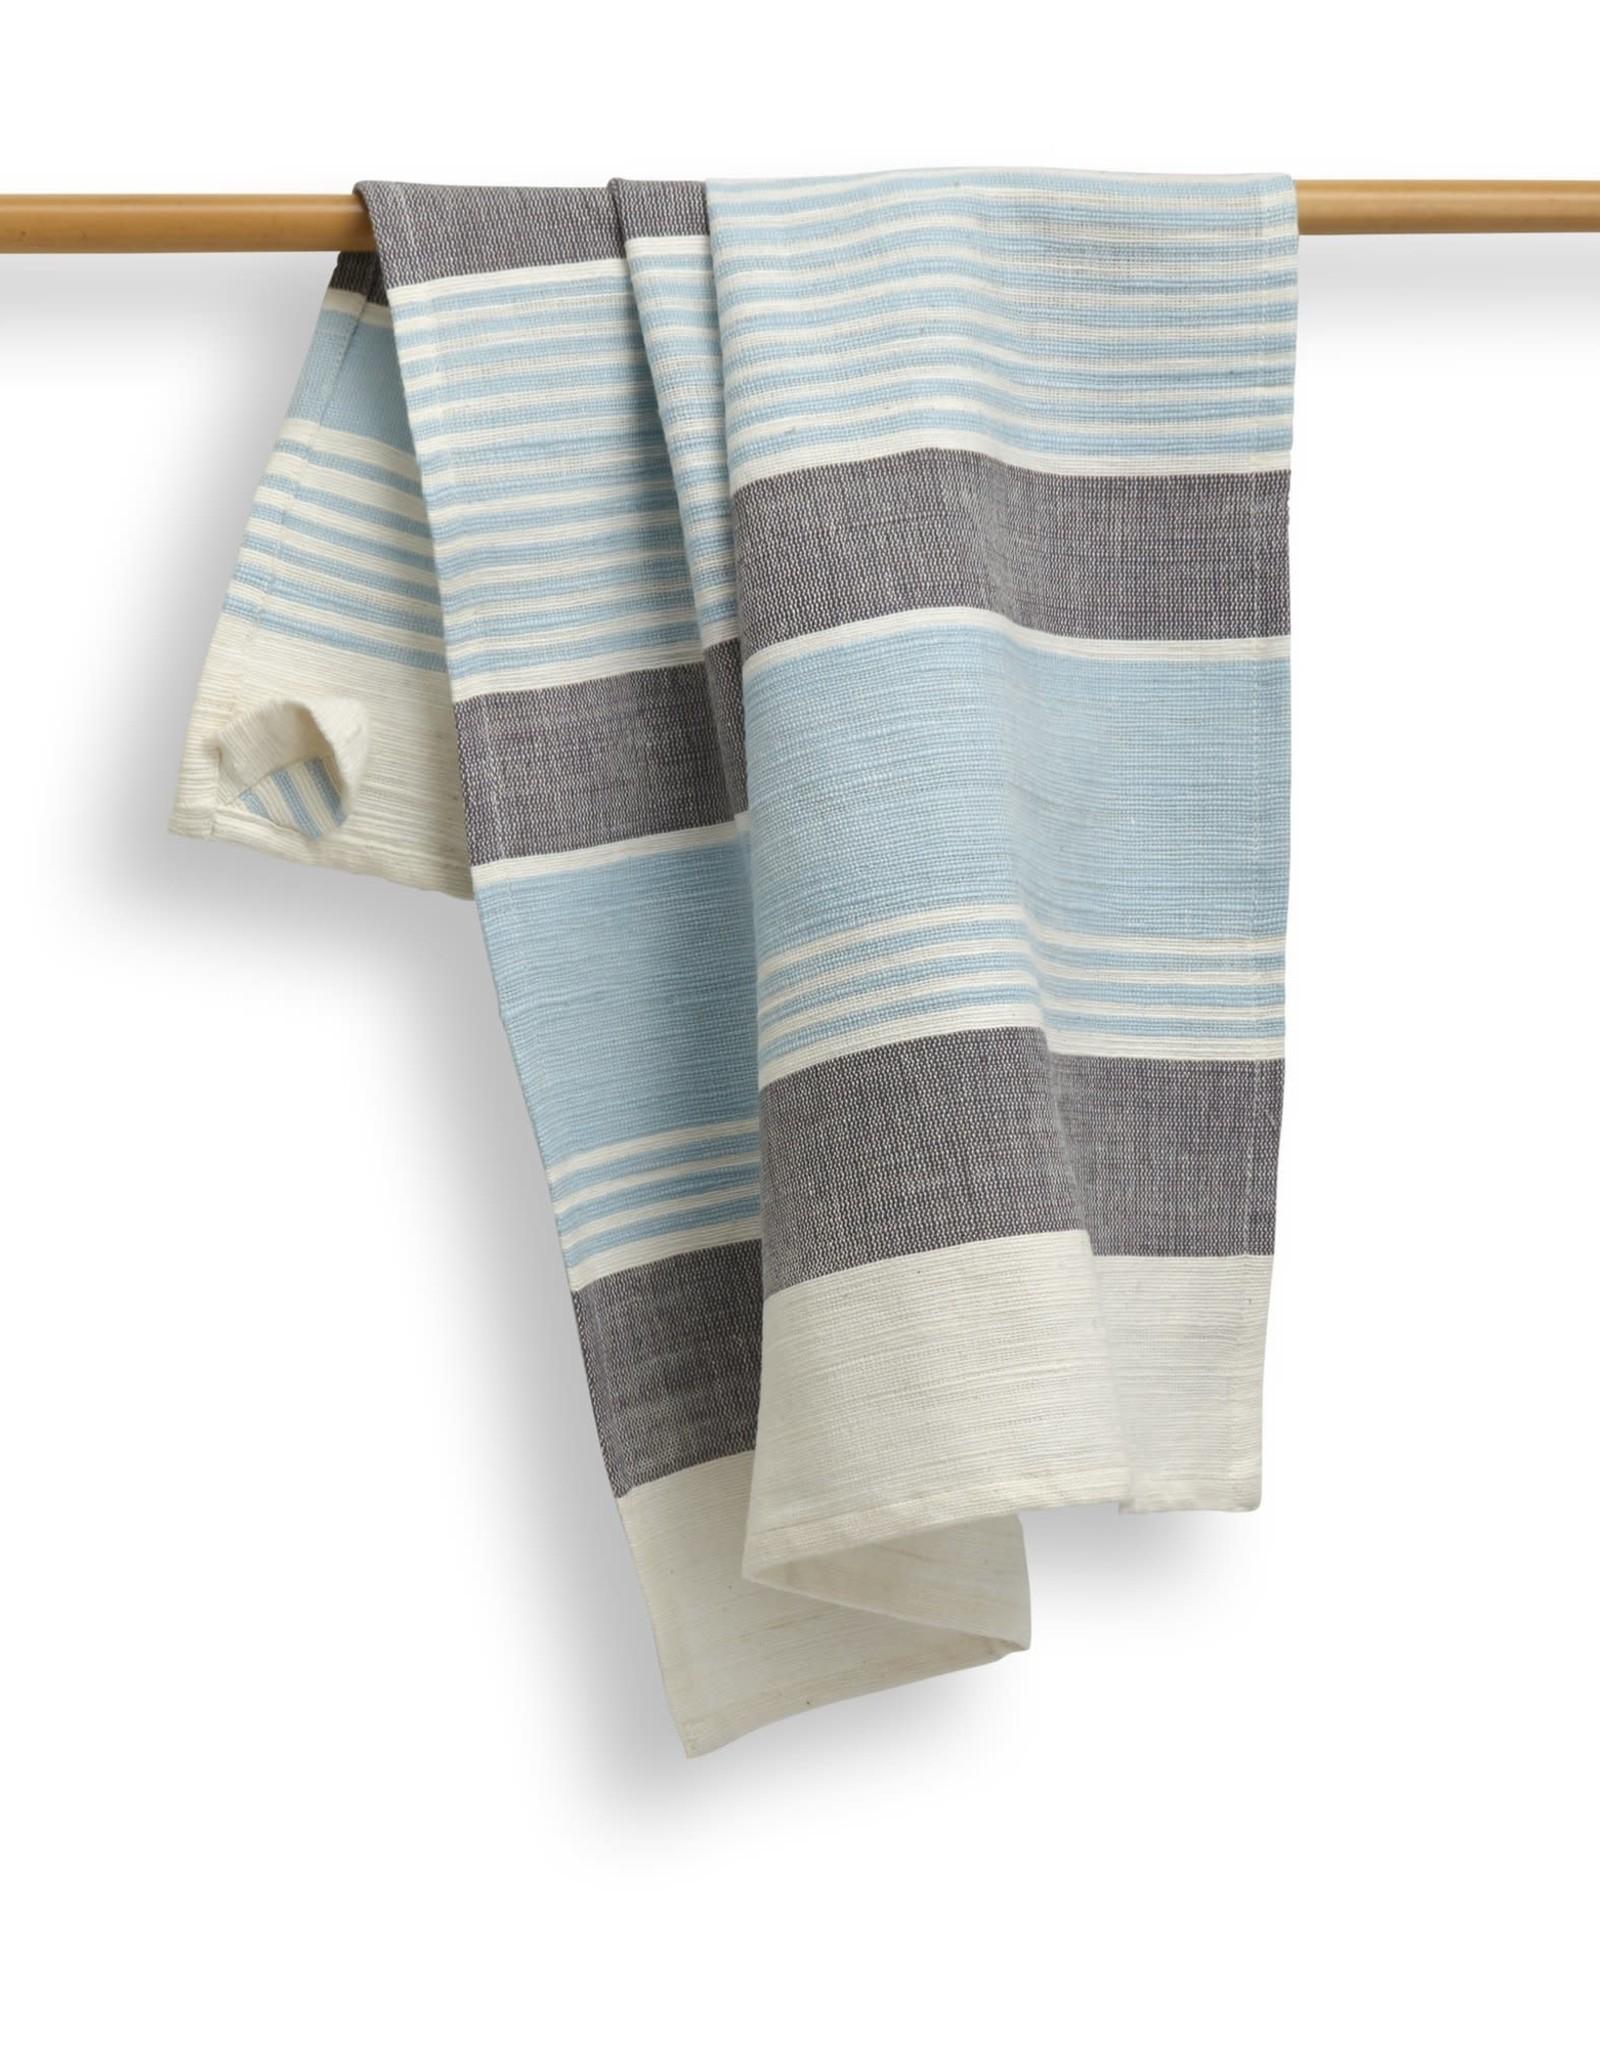 India, 27 x 19 Cotton Handwoven Kitchen Towels Maya